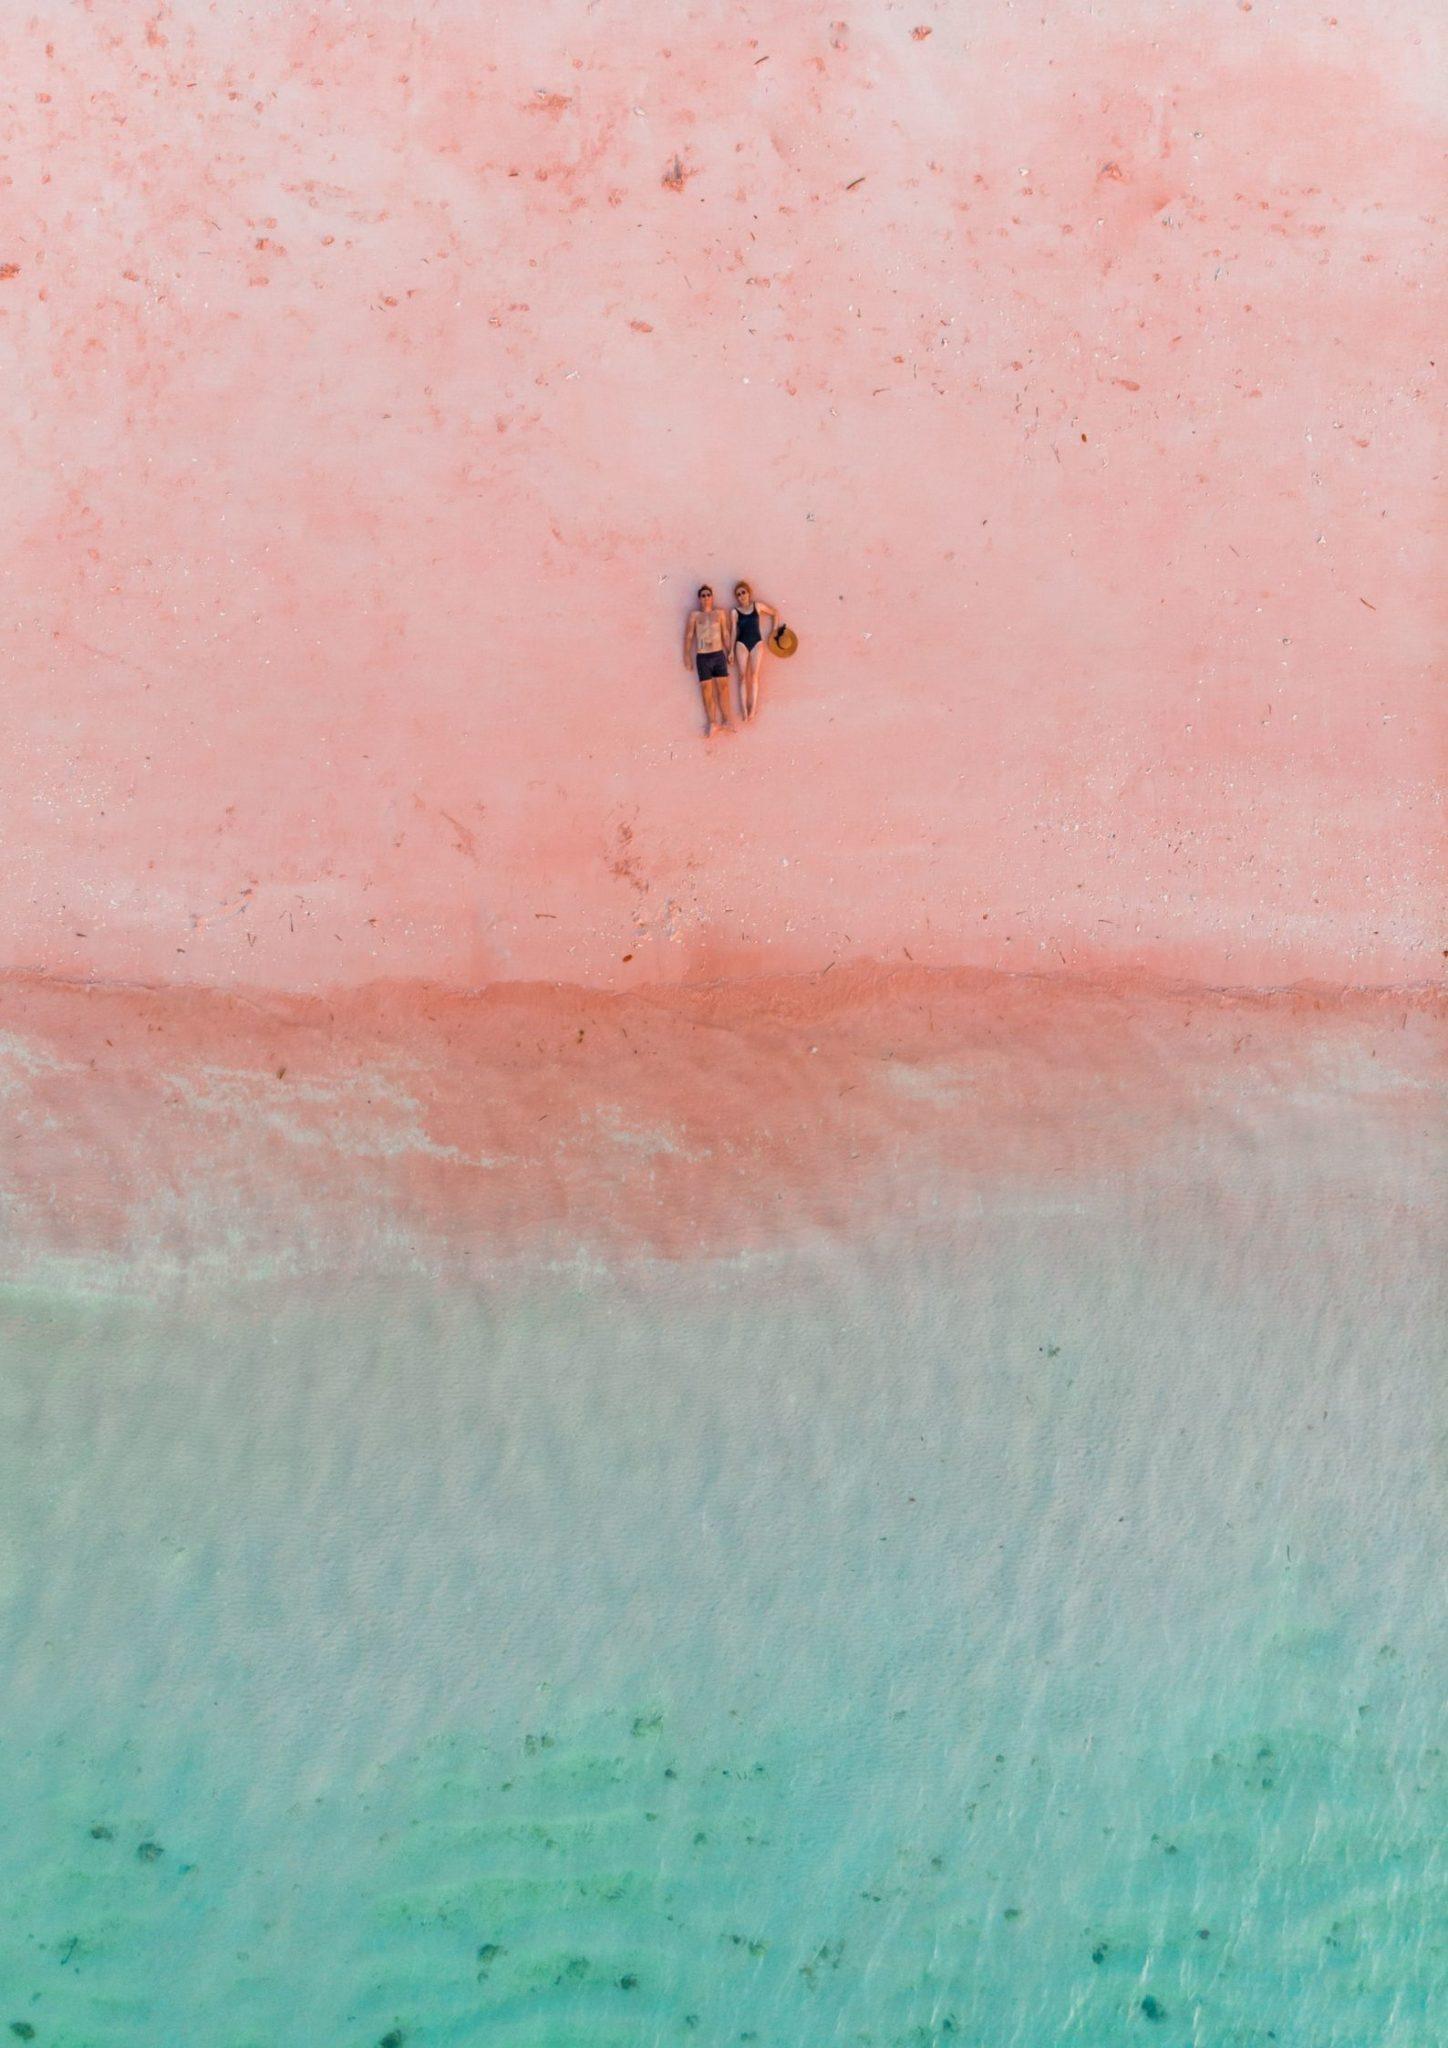 Pink Beach Indonesia | WORLD OF WANDERLUST